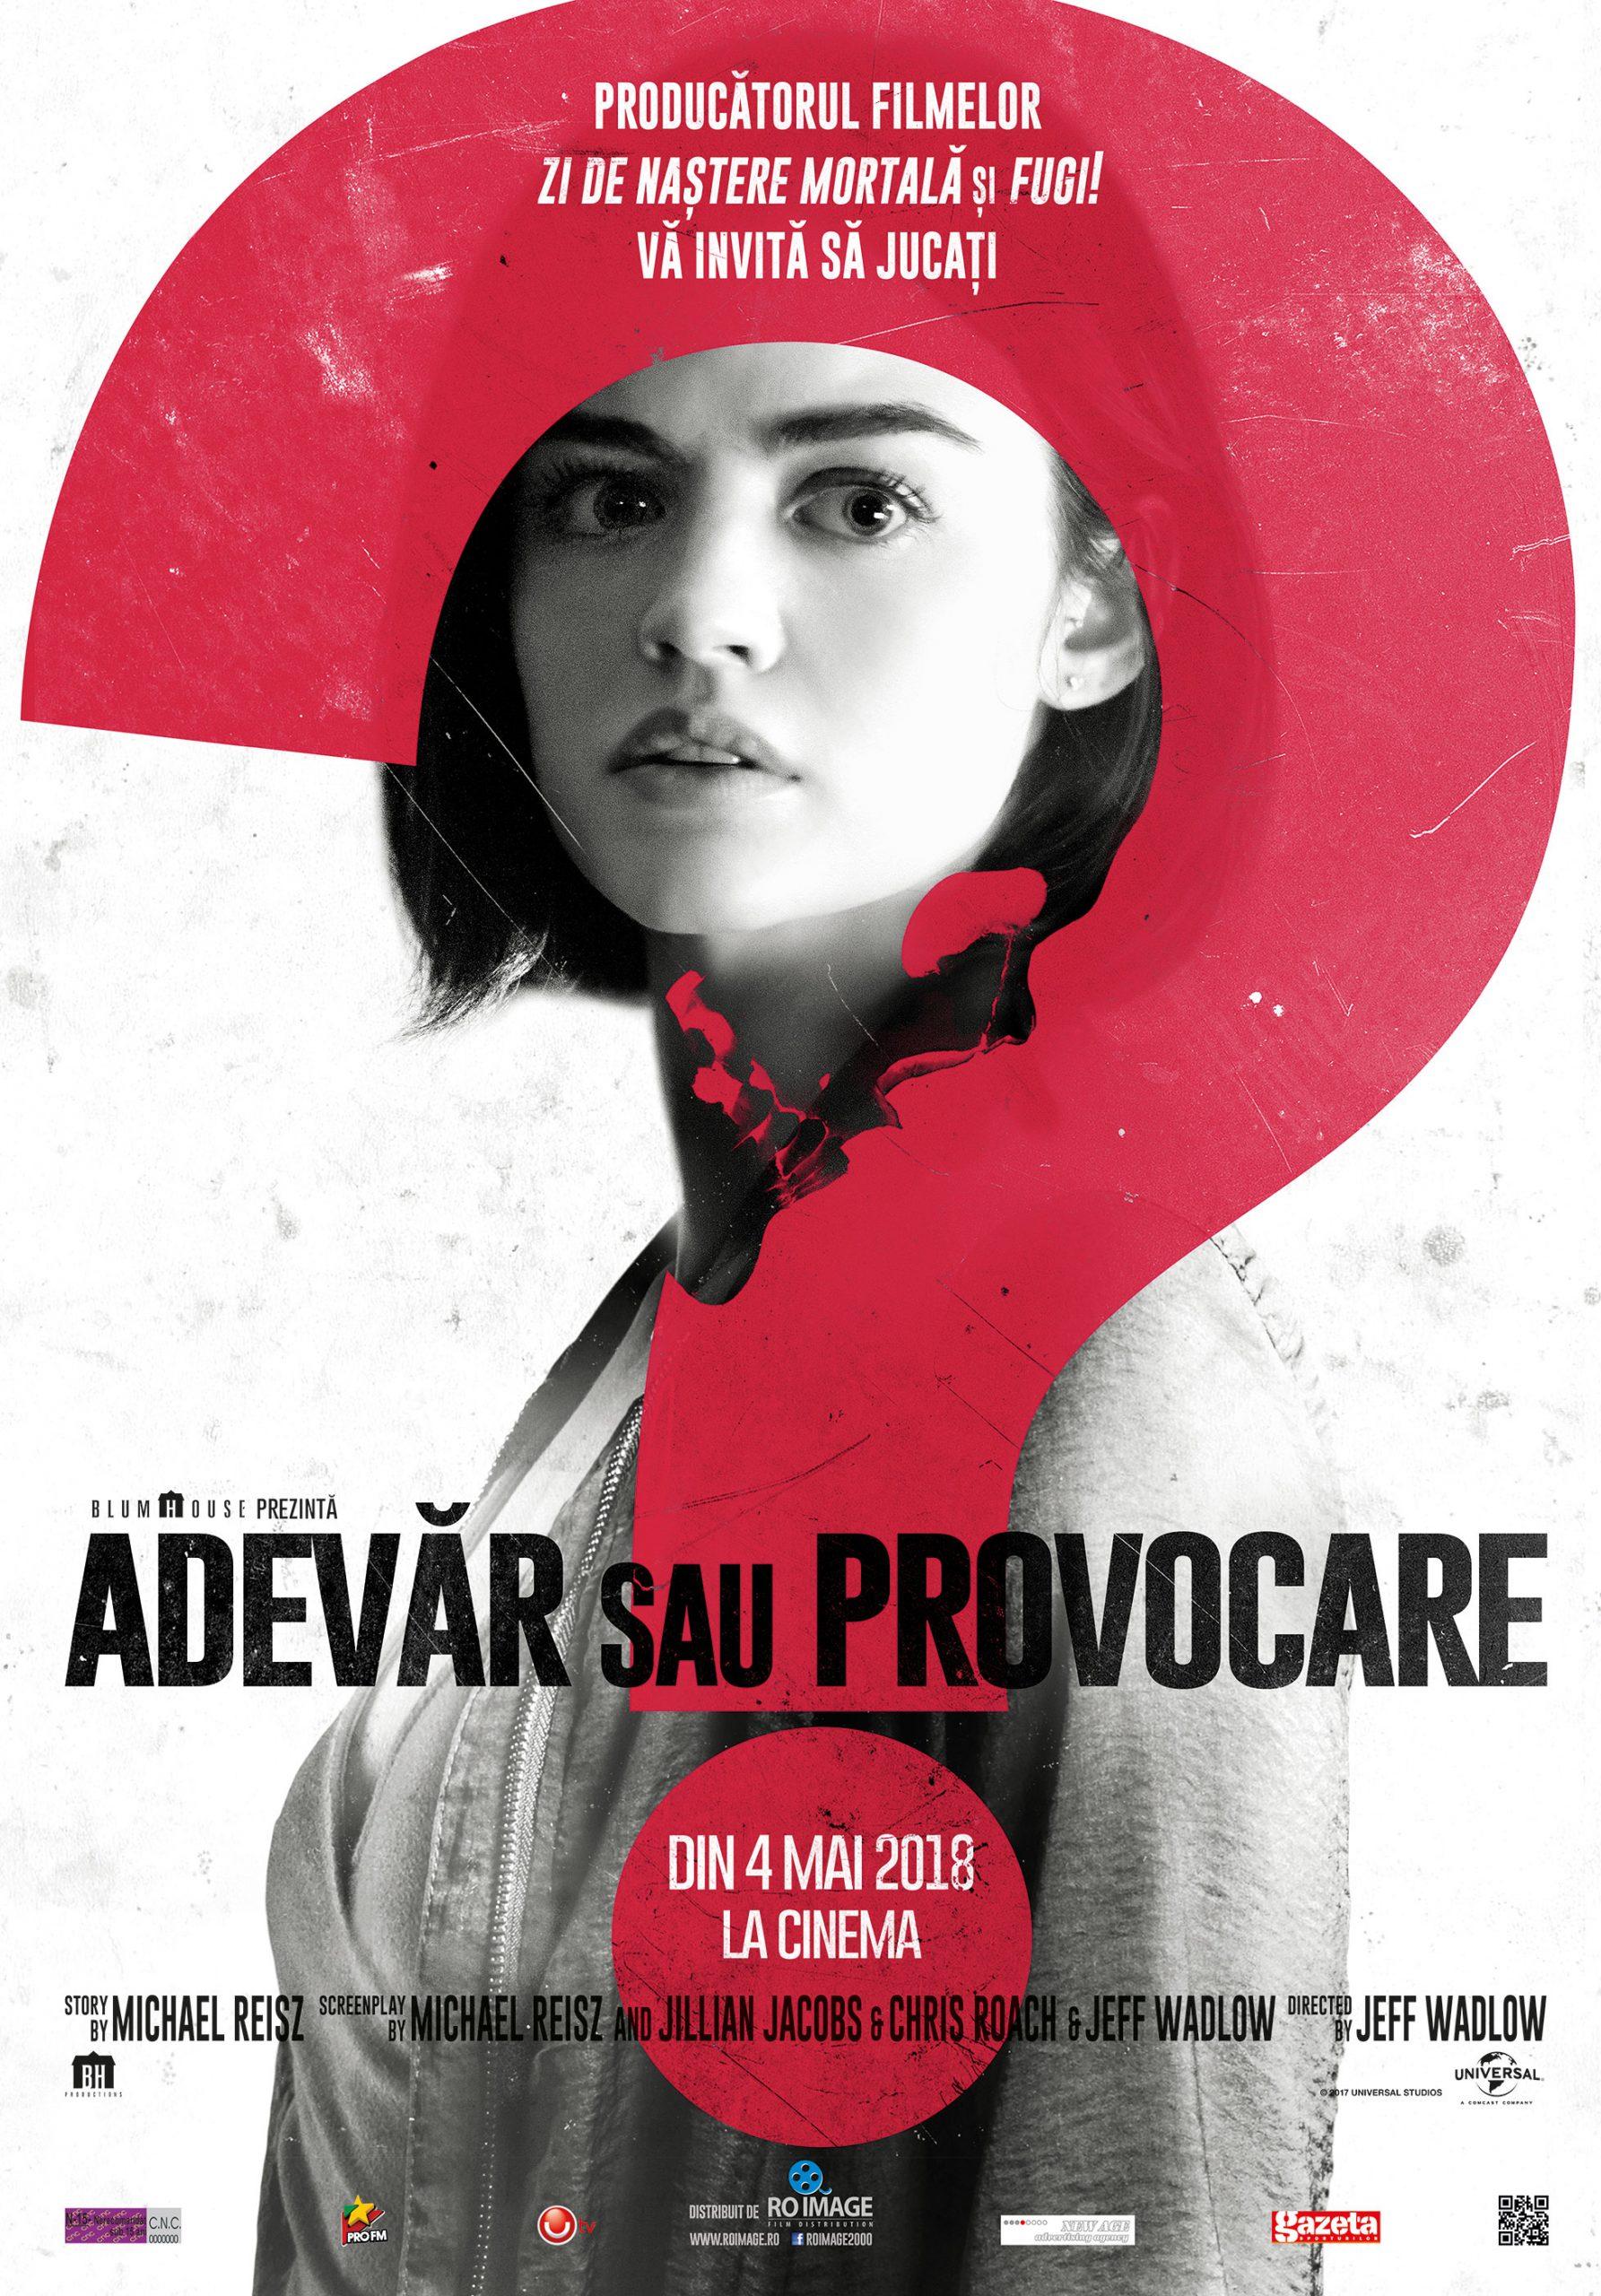 Adevar sau provocare (2018) Film Online Subtitrat in Romana